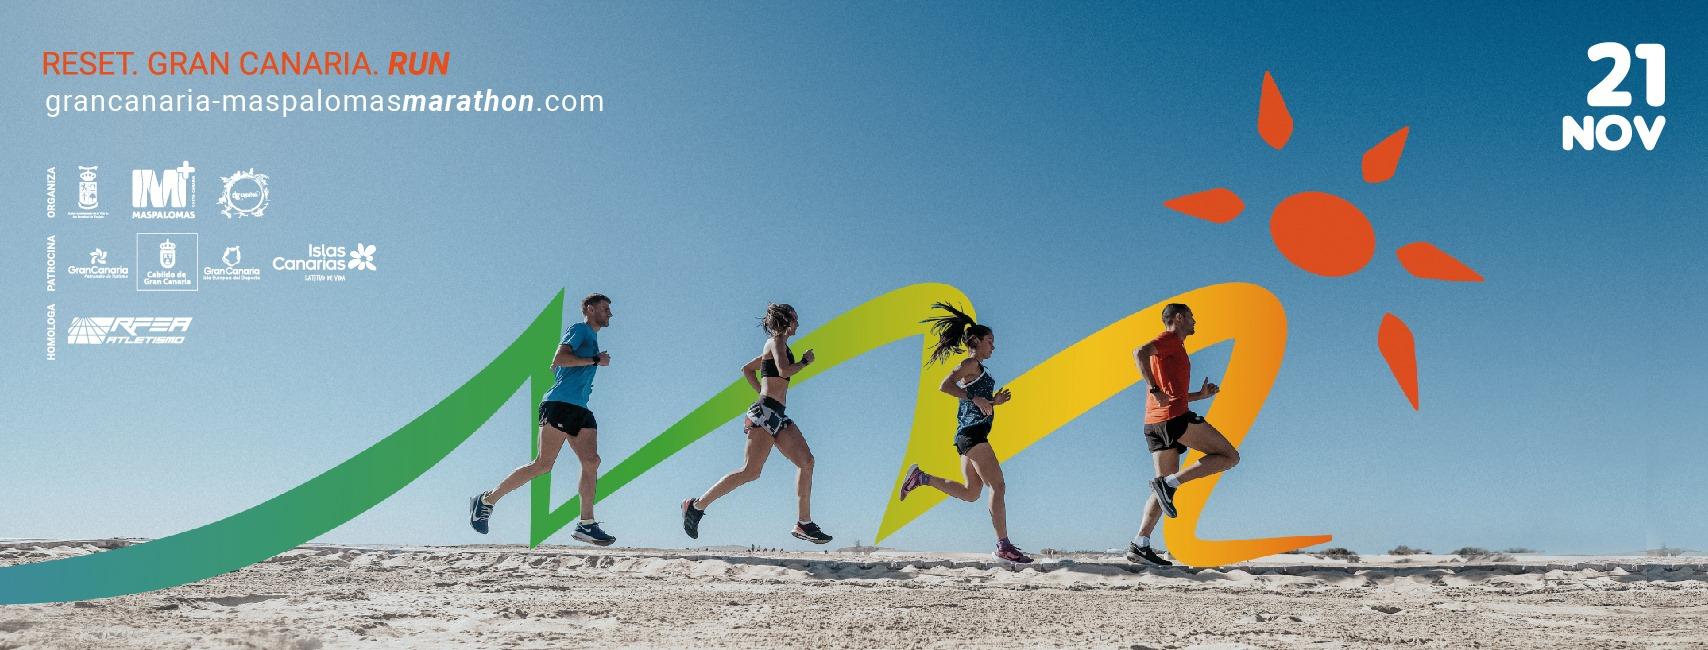 Portada 2 Gran Canaria Maspalomas Marathon 2021